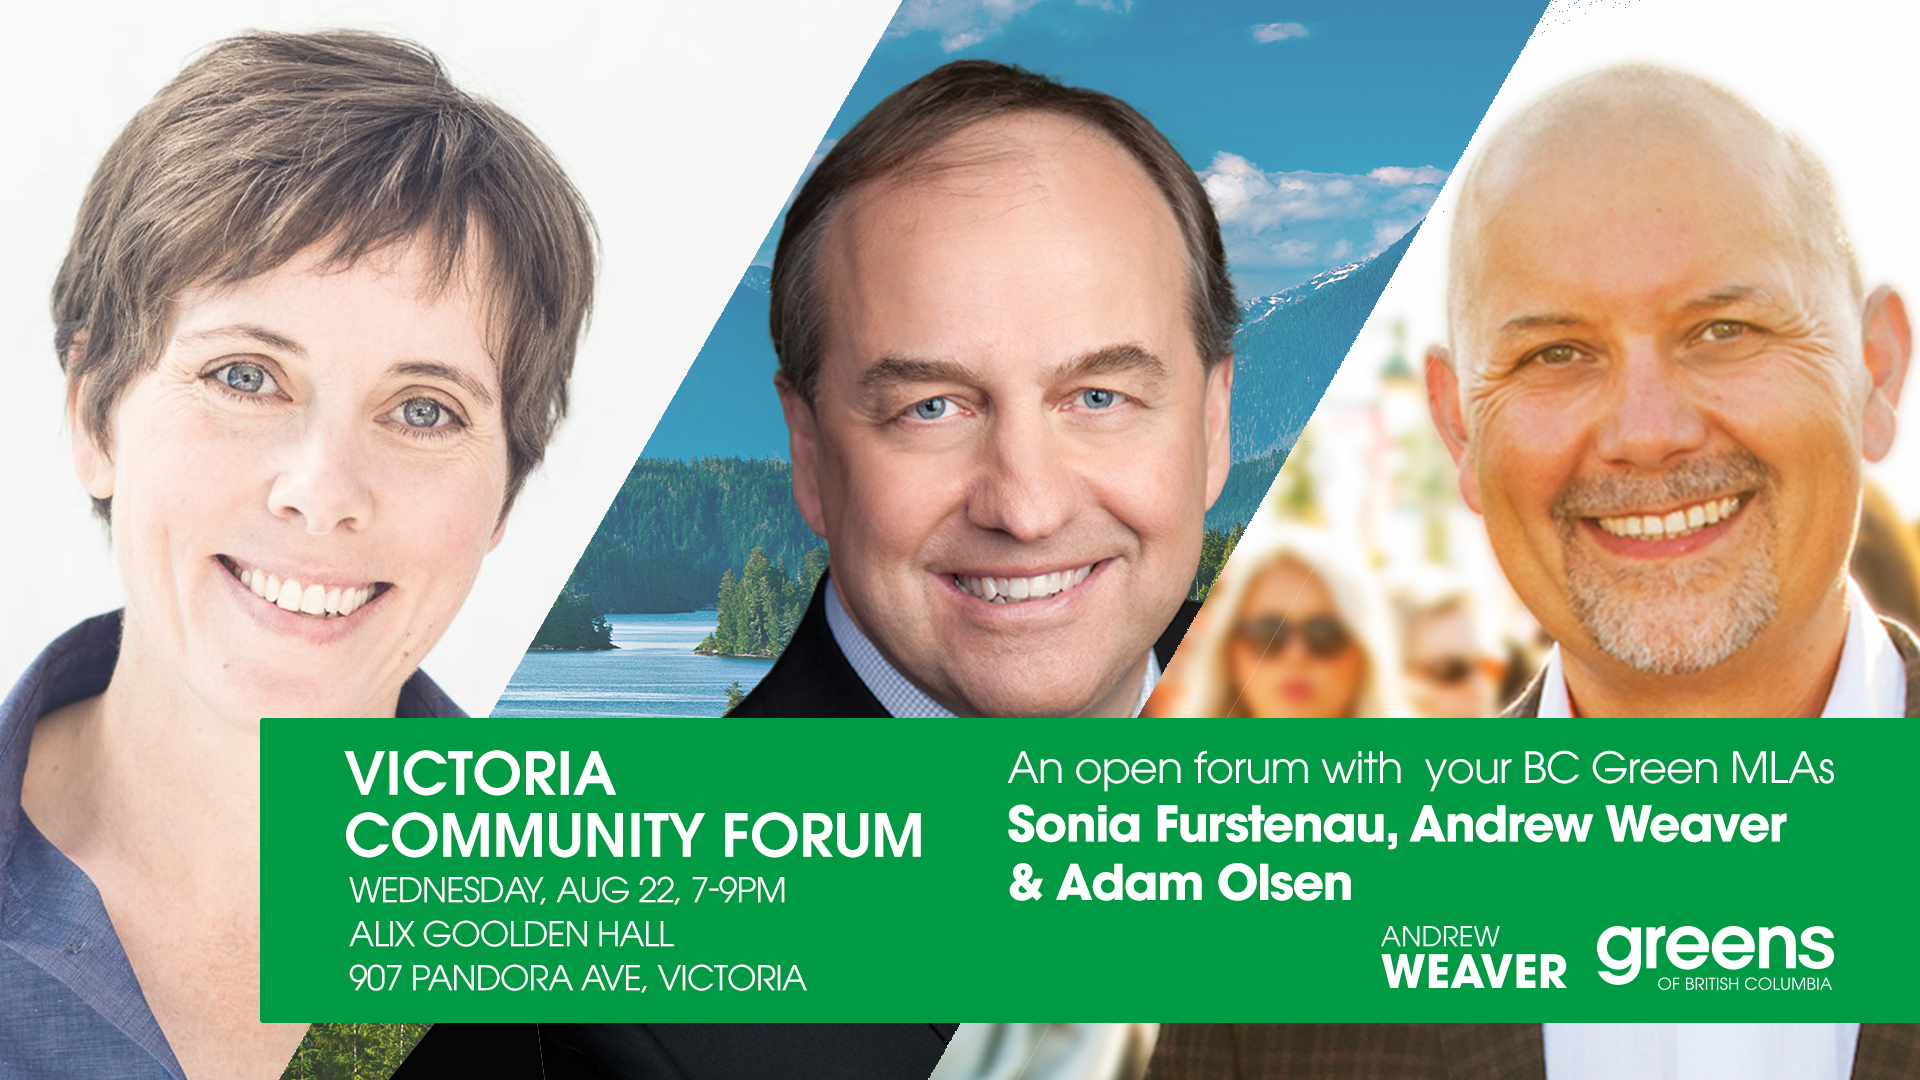 180807-Victoria_Community_ForumFacebook_Event_PhotoFacebook_Event_Photo.jpg